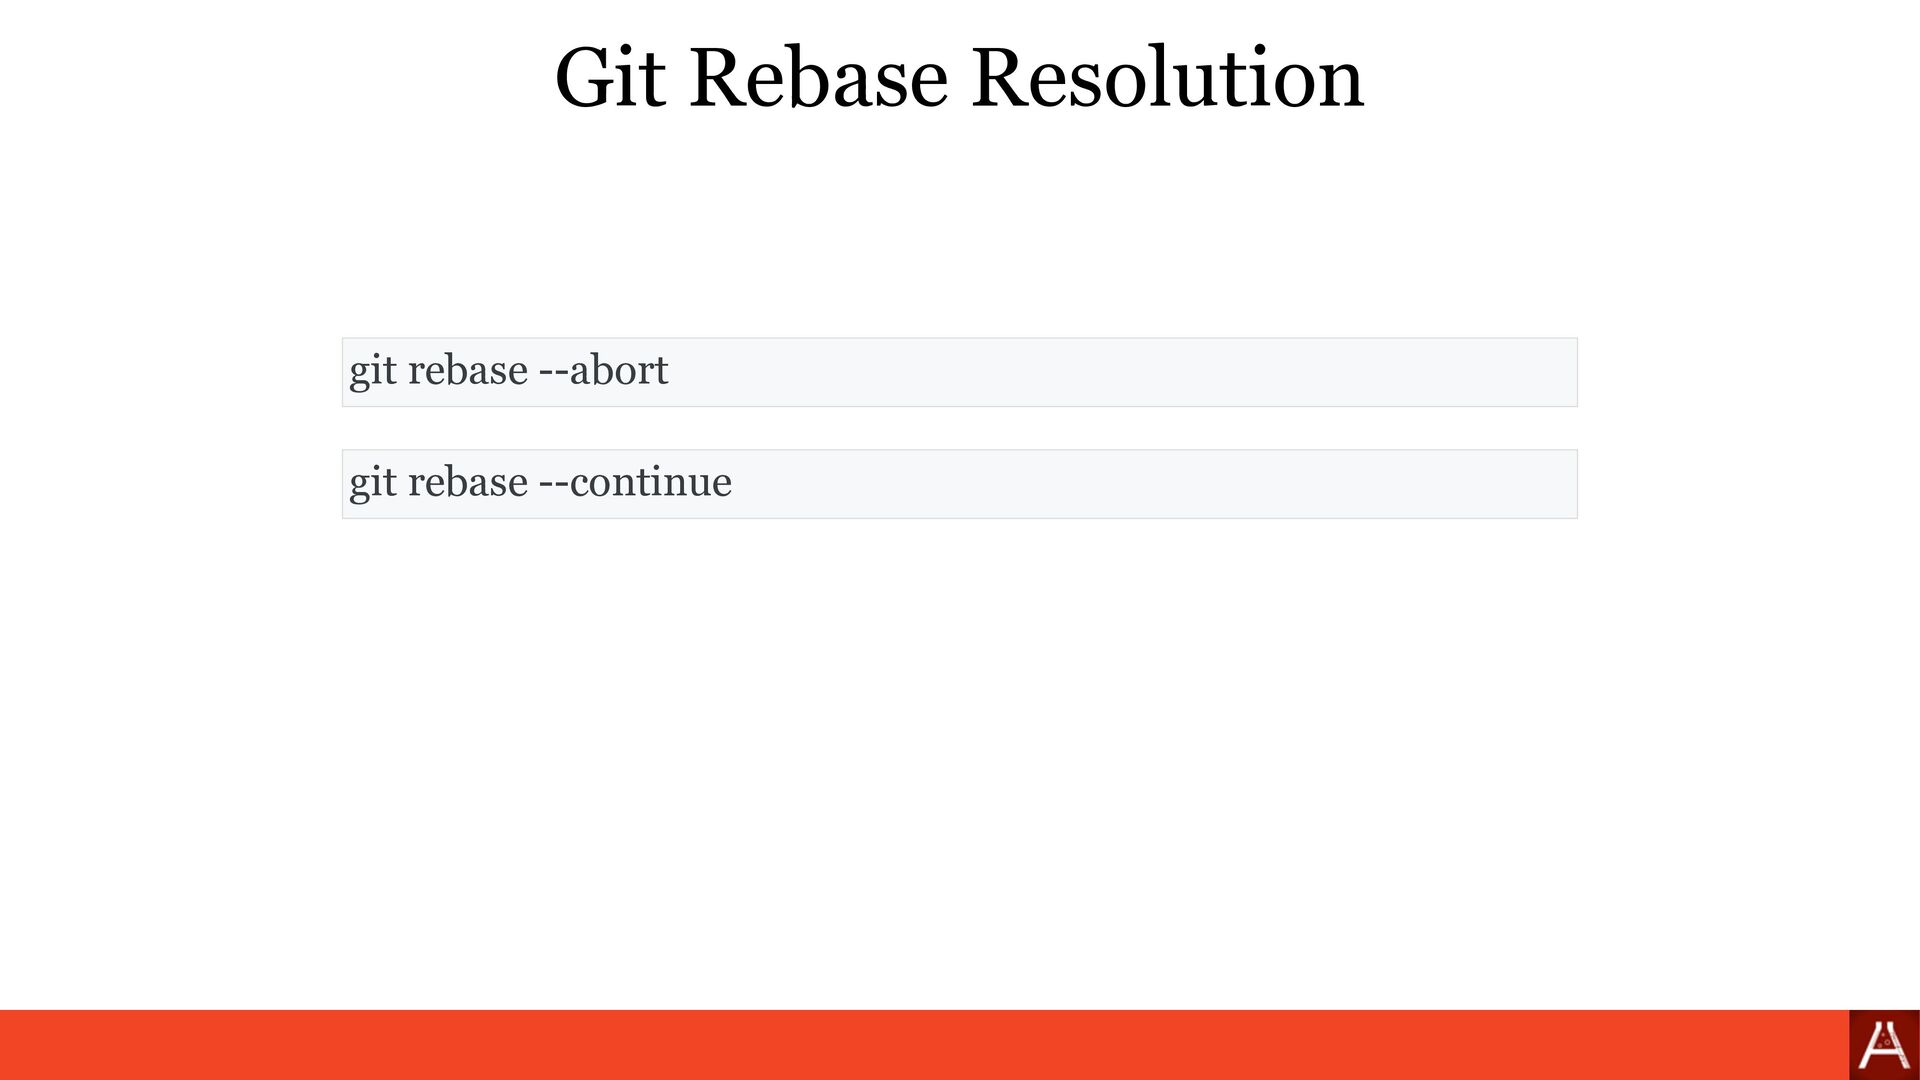 Git Commit (fixup) git commit --fixup 2dc5e2e29...